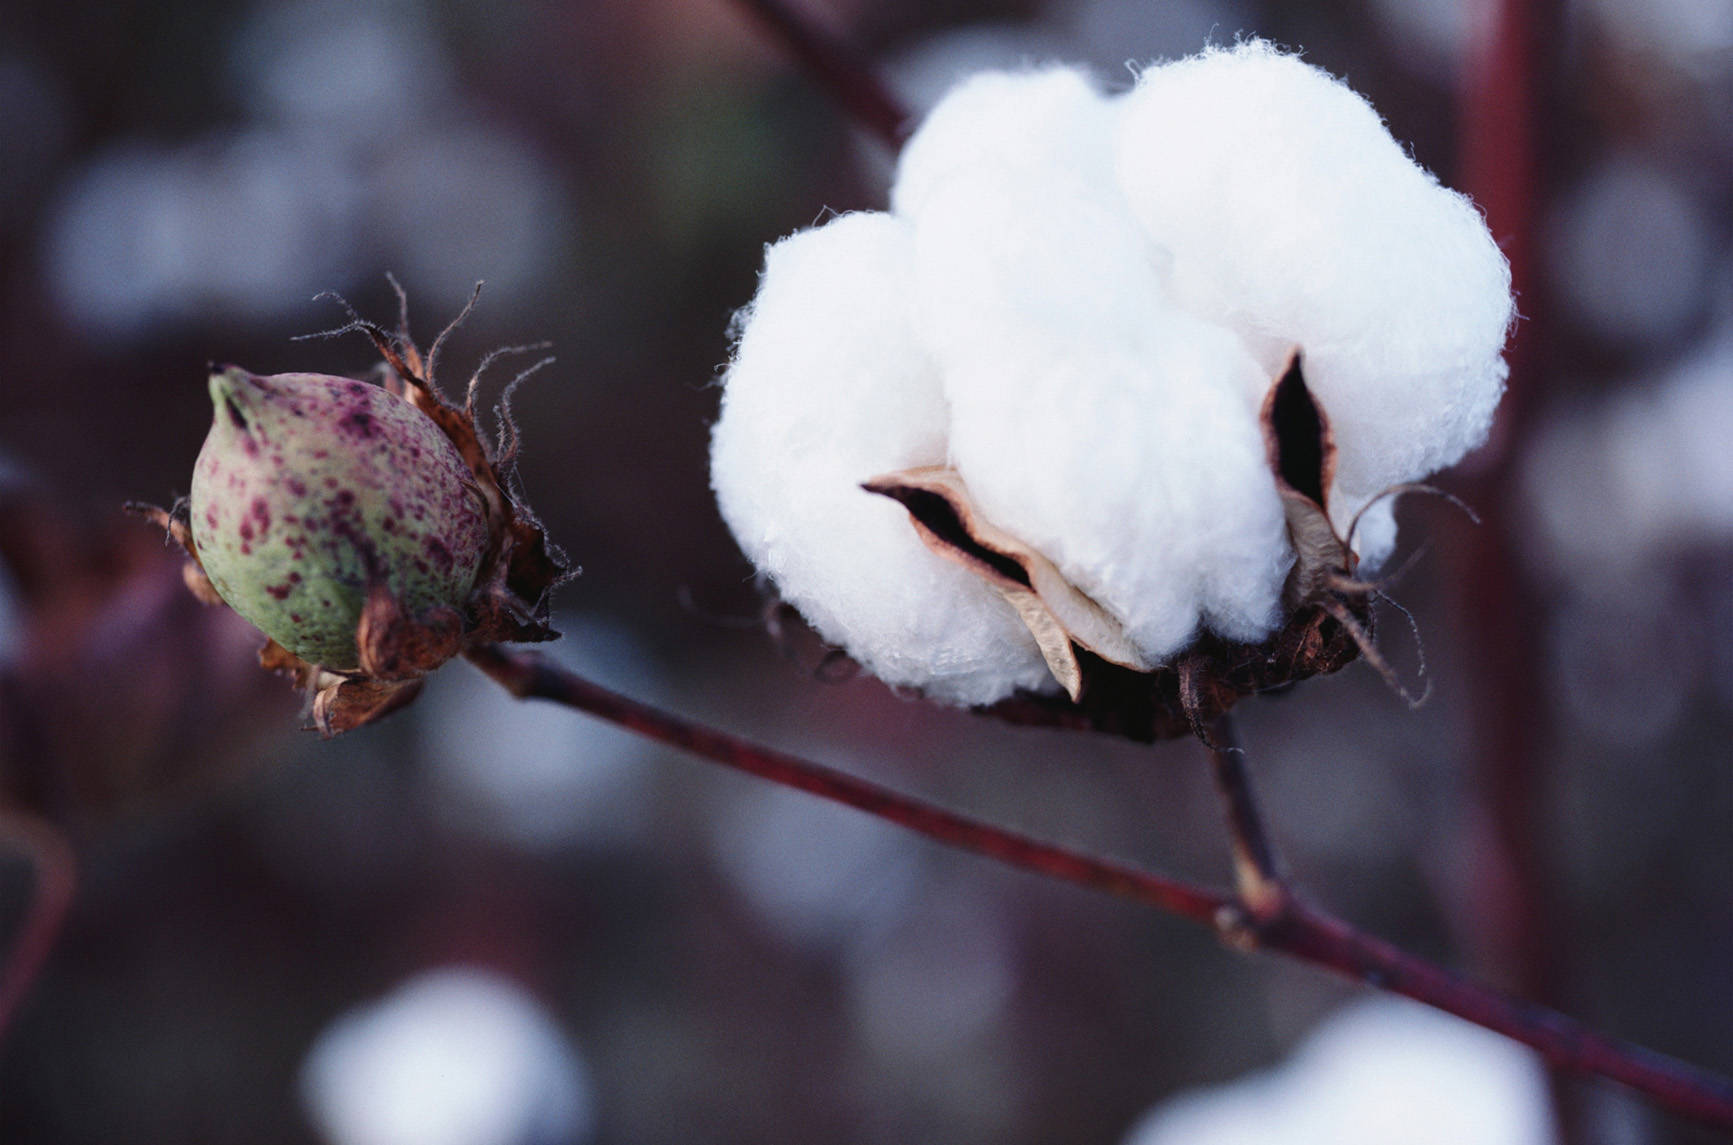 Pétalos de flor de algodón podían ayudar a tratar el Alzheimer